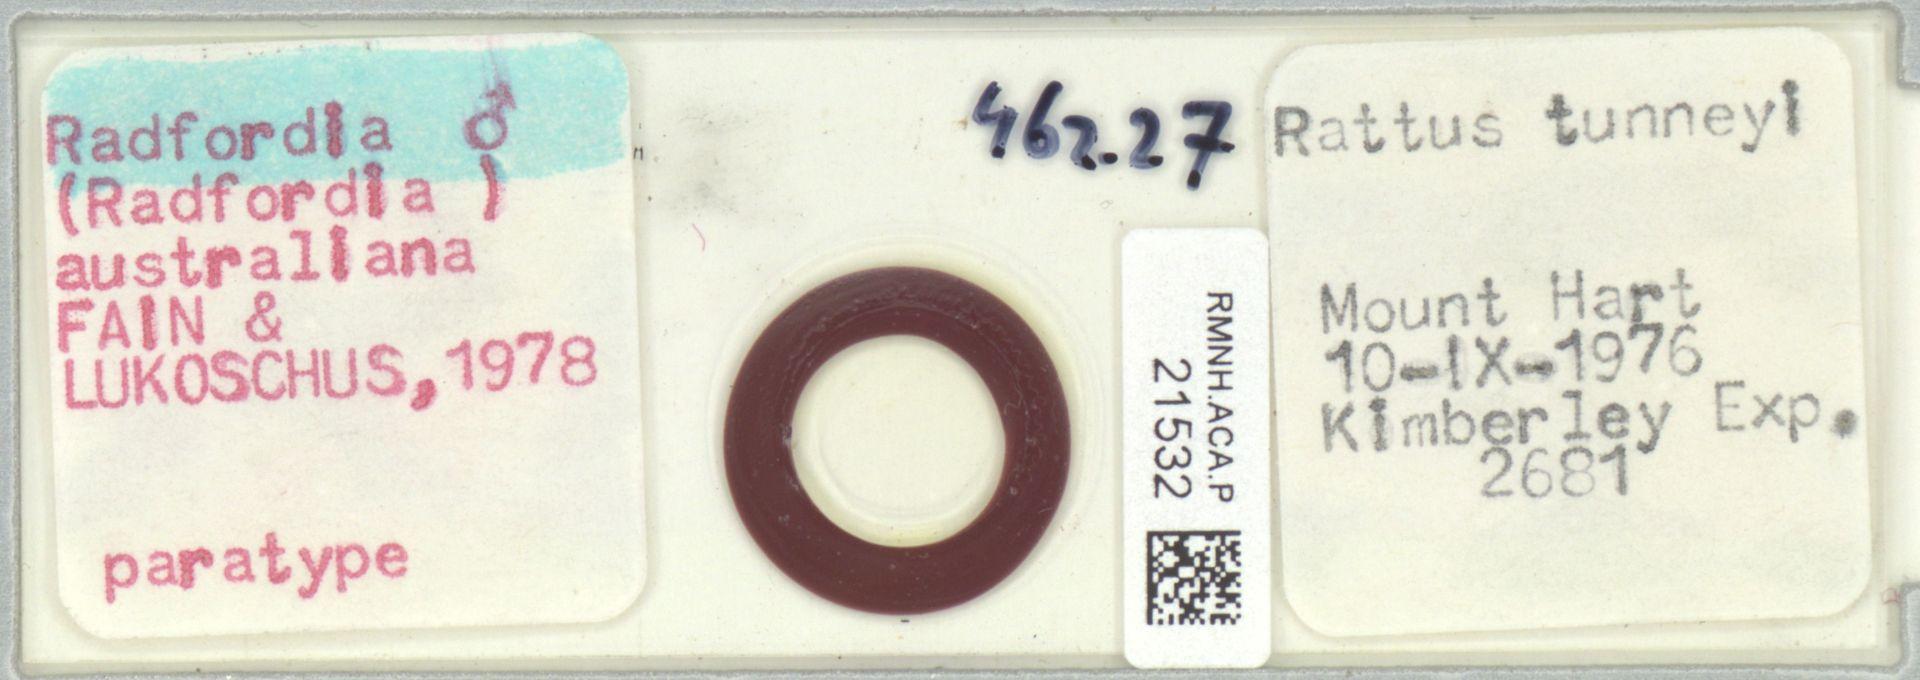 RMNH.ACA.P.21532 | Radfordia (Radfordia) australiana Fain & Lukoschus, 1978